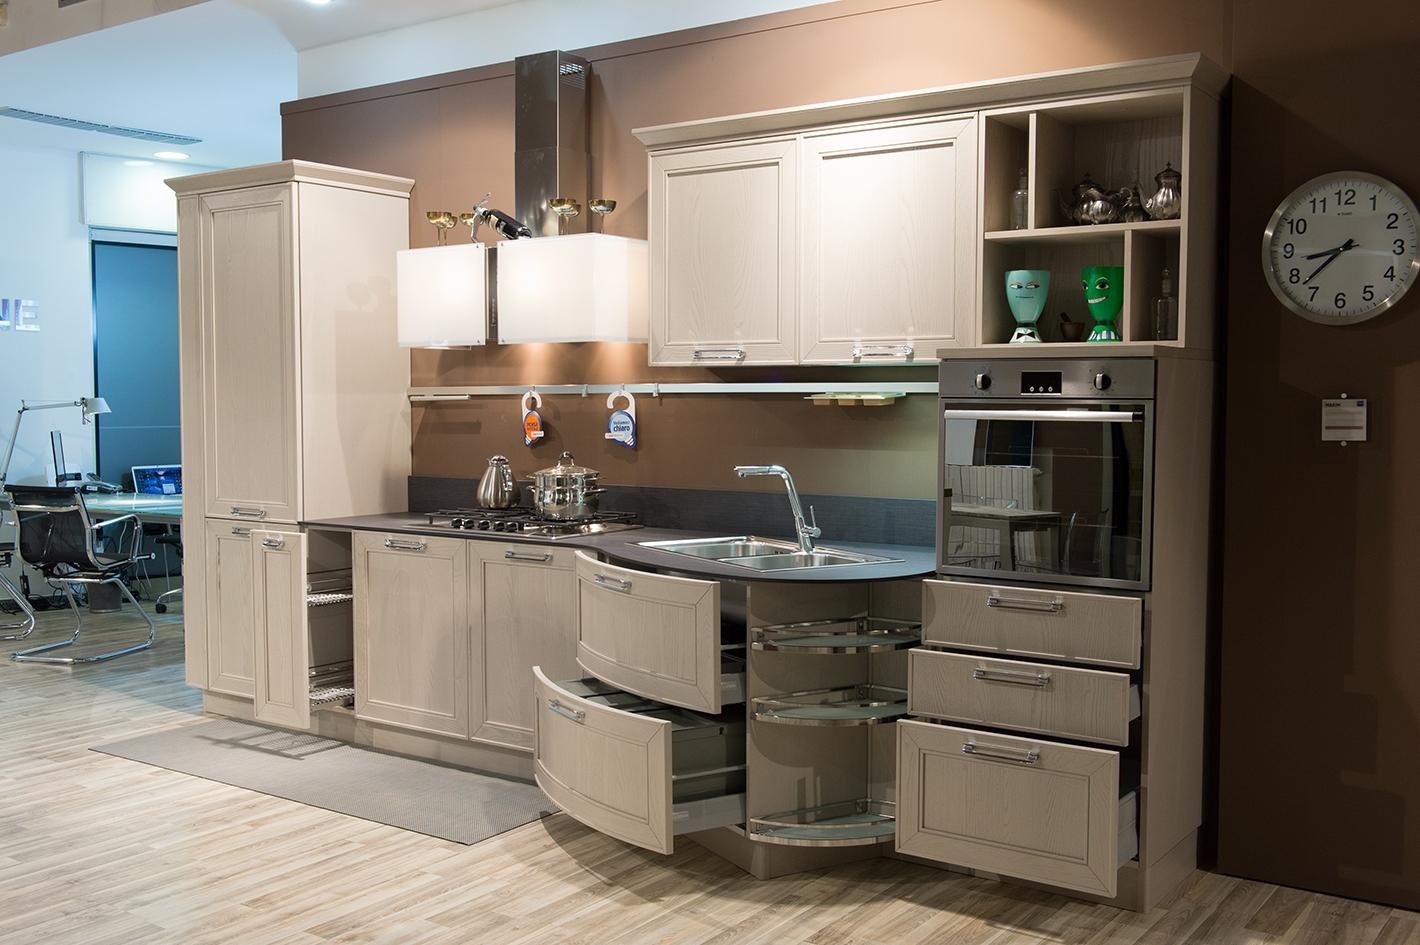 Cucina Stosa MAXIM in offerta completa di elettrodomestici - Cucine a prezzi ...